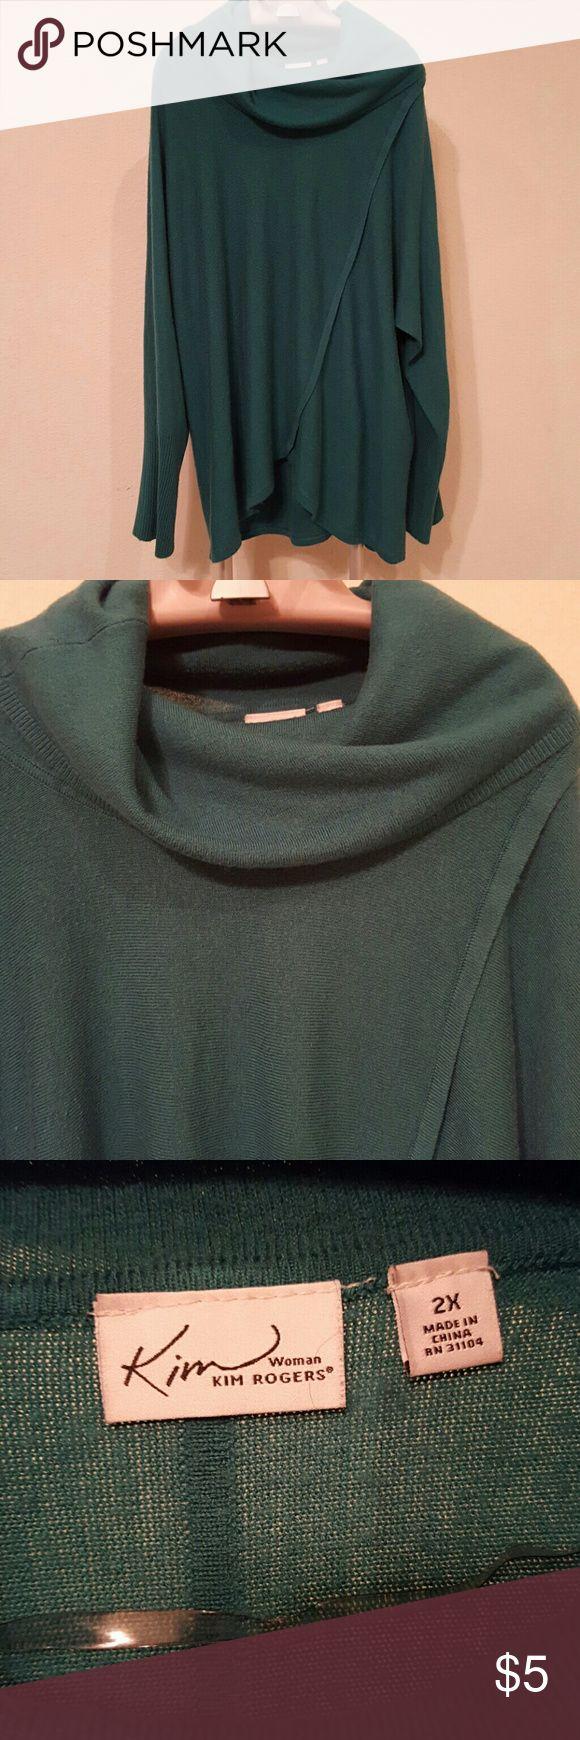 Kim Rogers Cowl neck sweater Teal Kim Rogers cowl neck sweater. Super soft! Used condition Kim Rogers Sweaters Cowl & Turtlenecks